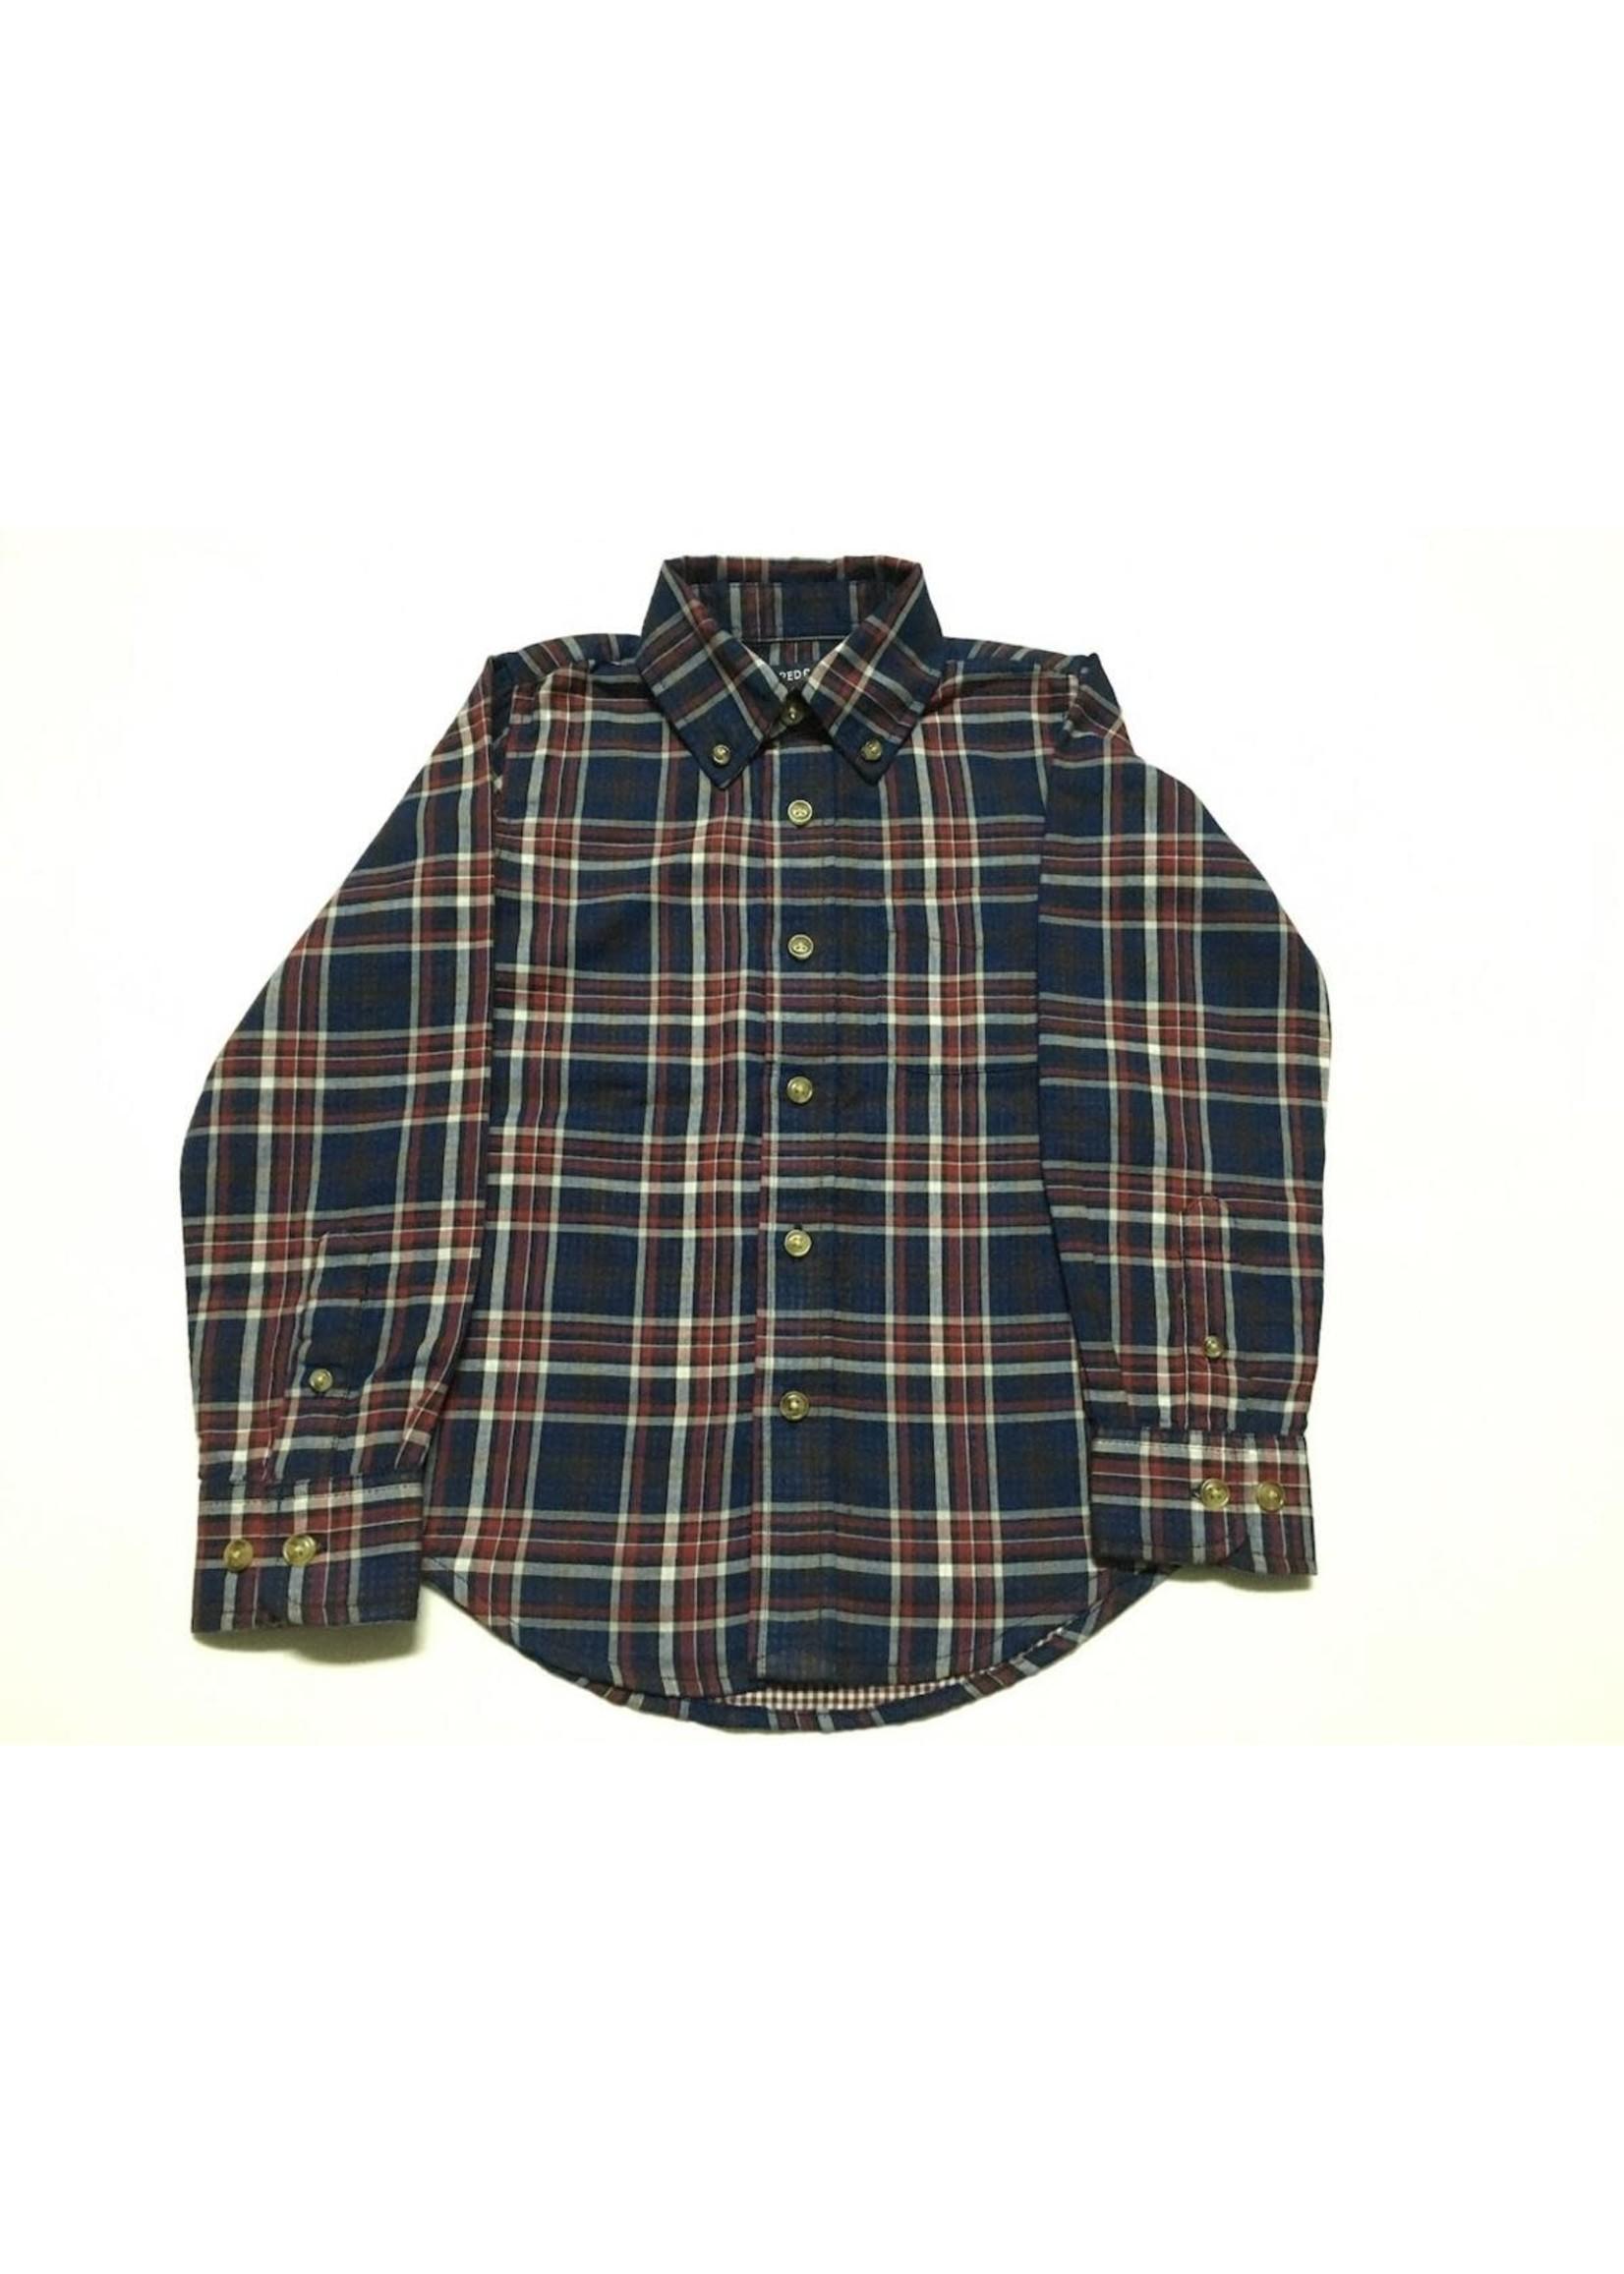 Pedal Pedal Navy Long Sleeve Plaid Shirt